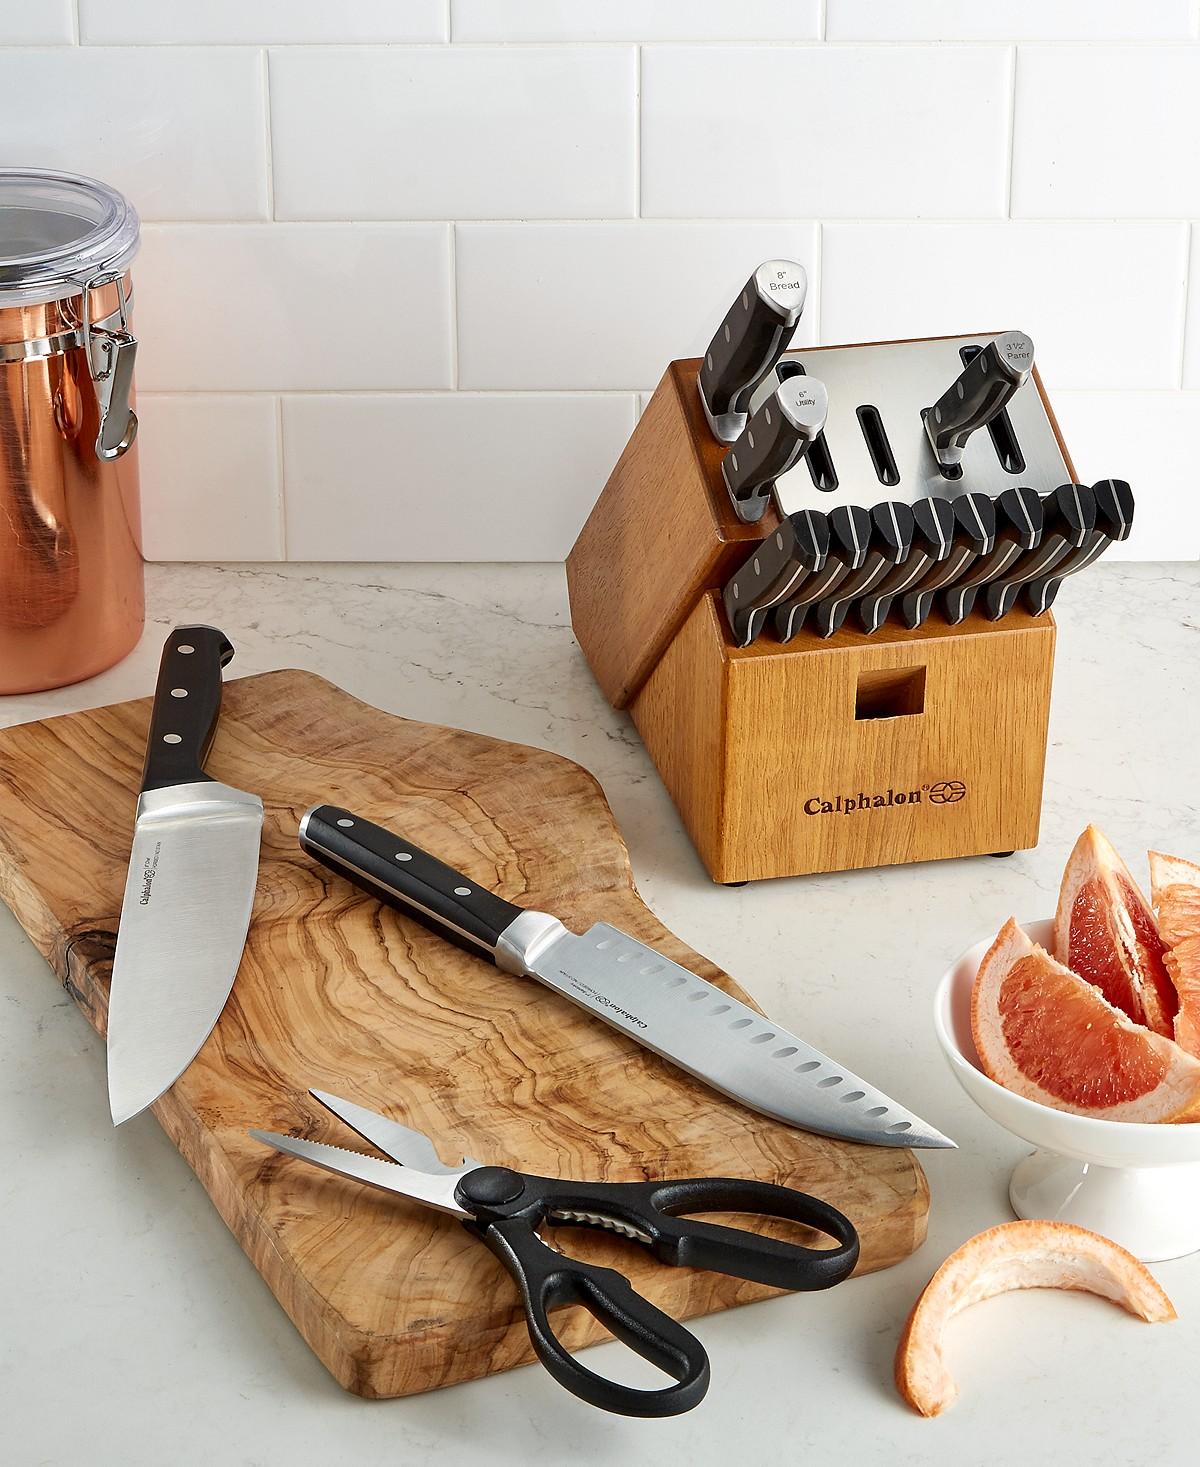 Calphalon Classic SharpIN Self Sharpening 15-Piece Cutlery Set $115 Shipped